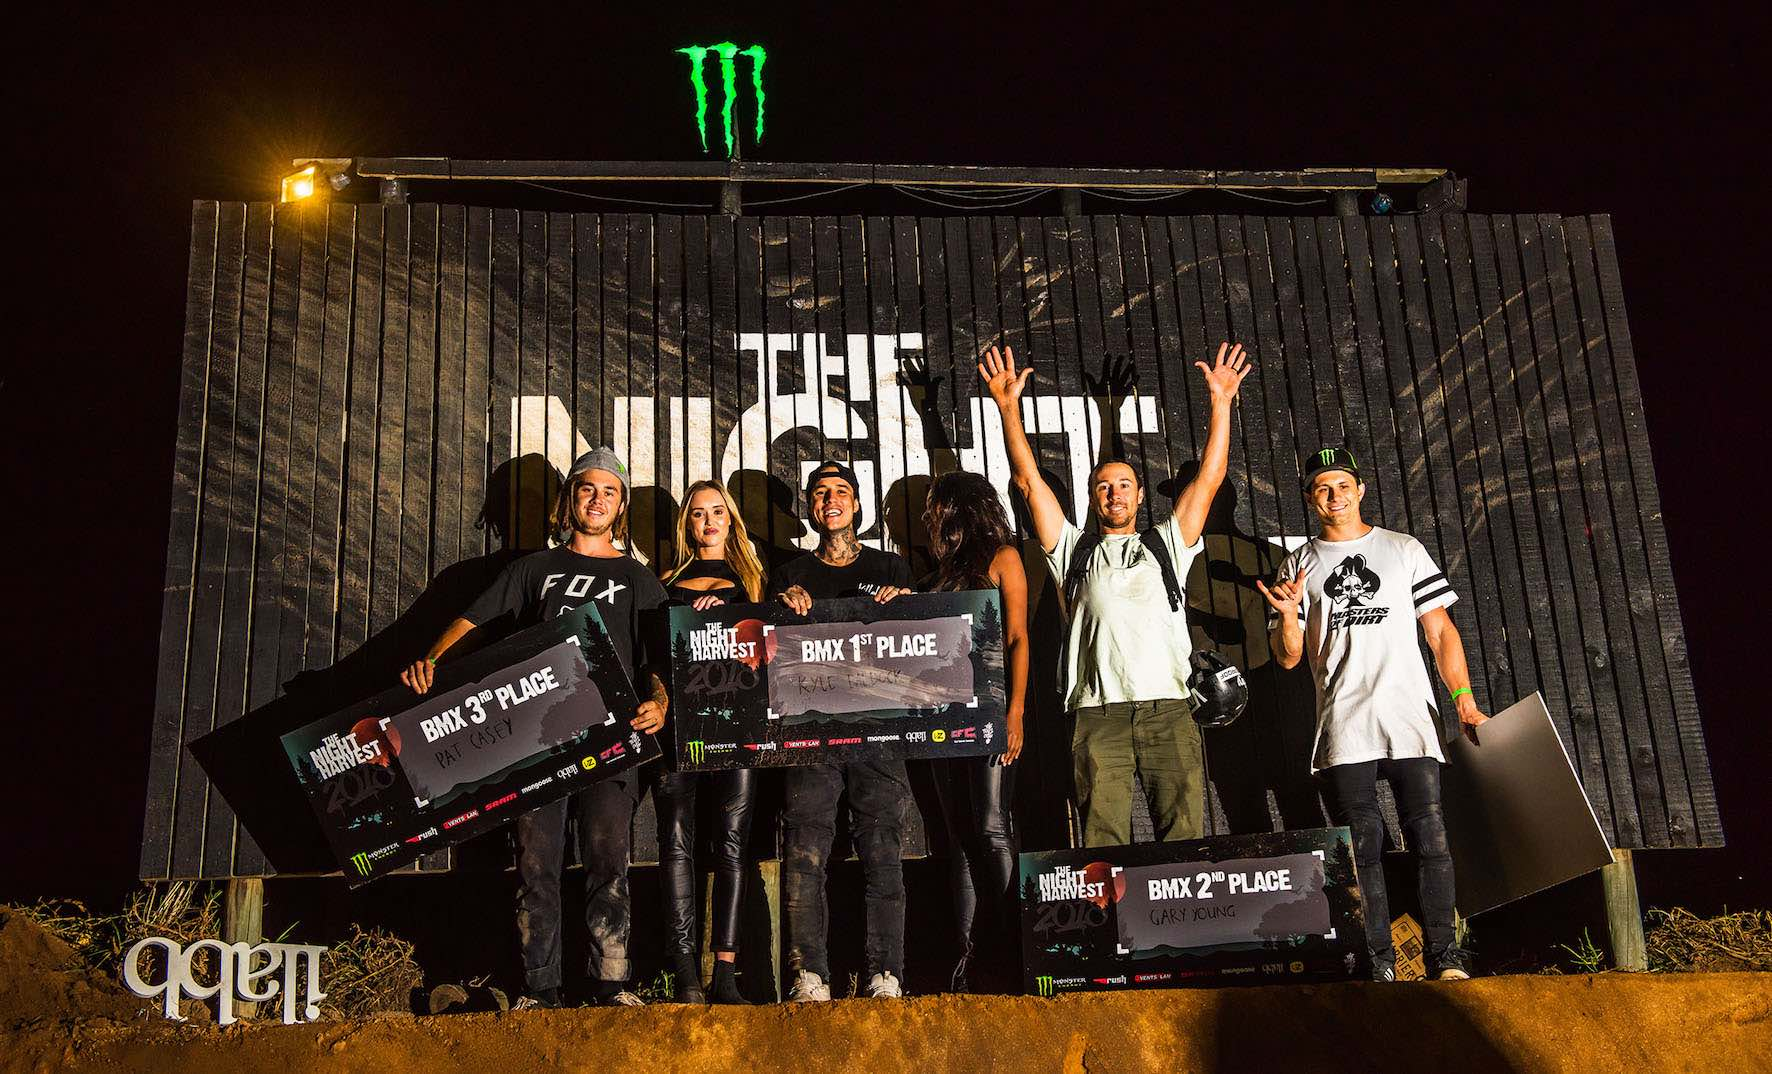 The Night Harvest 2018 BMX podium